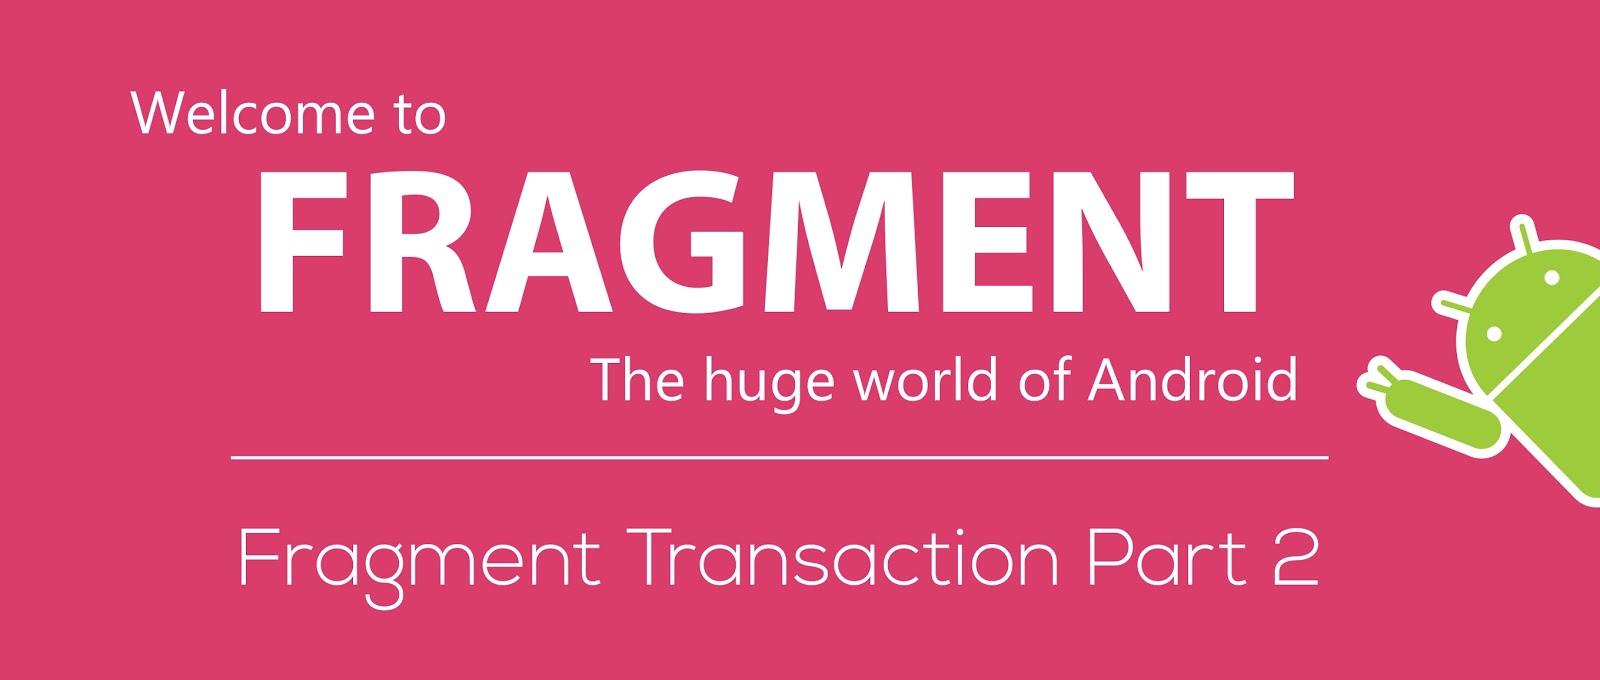 Android Code] Let's Fragment - รู้จักกับ FragmentTransaction สำหรับ